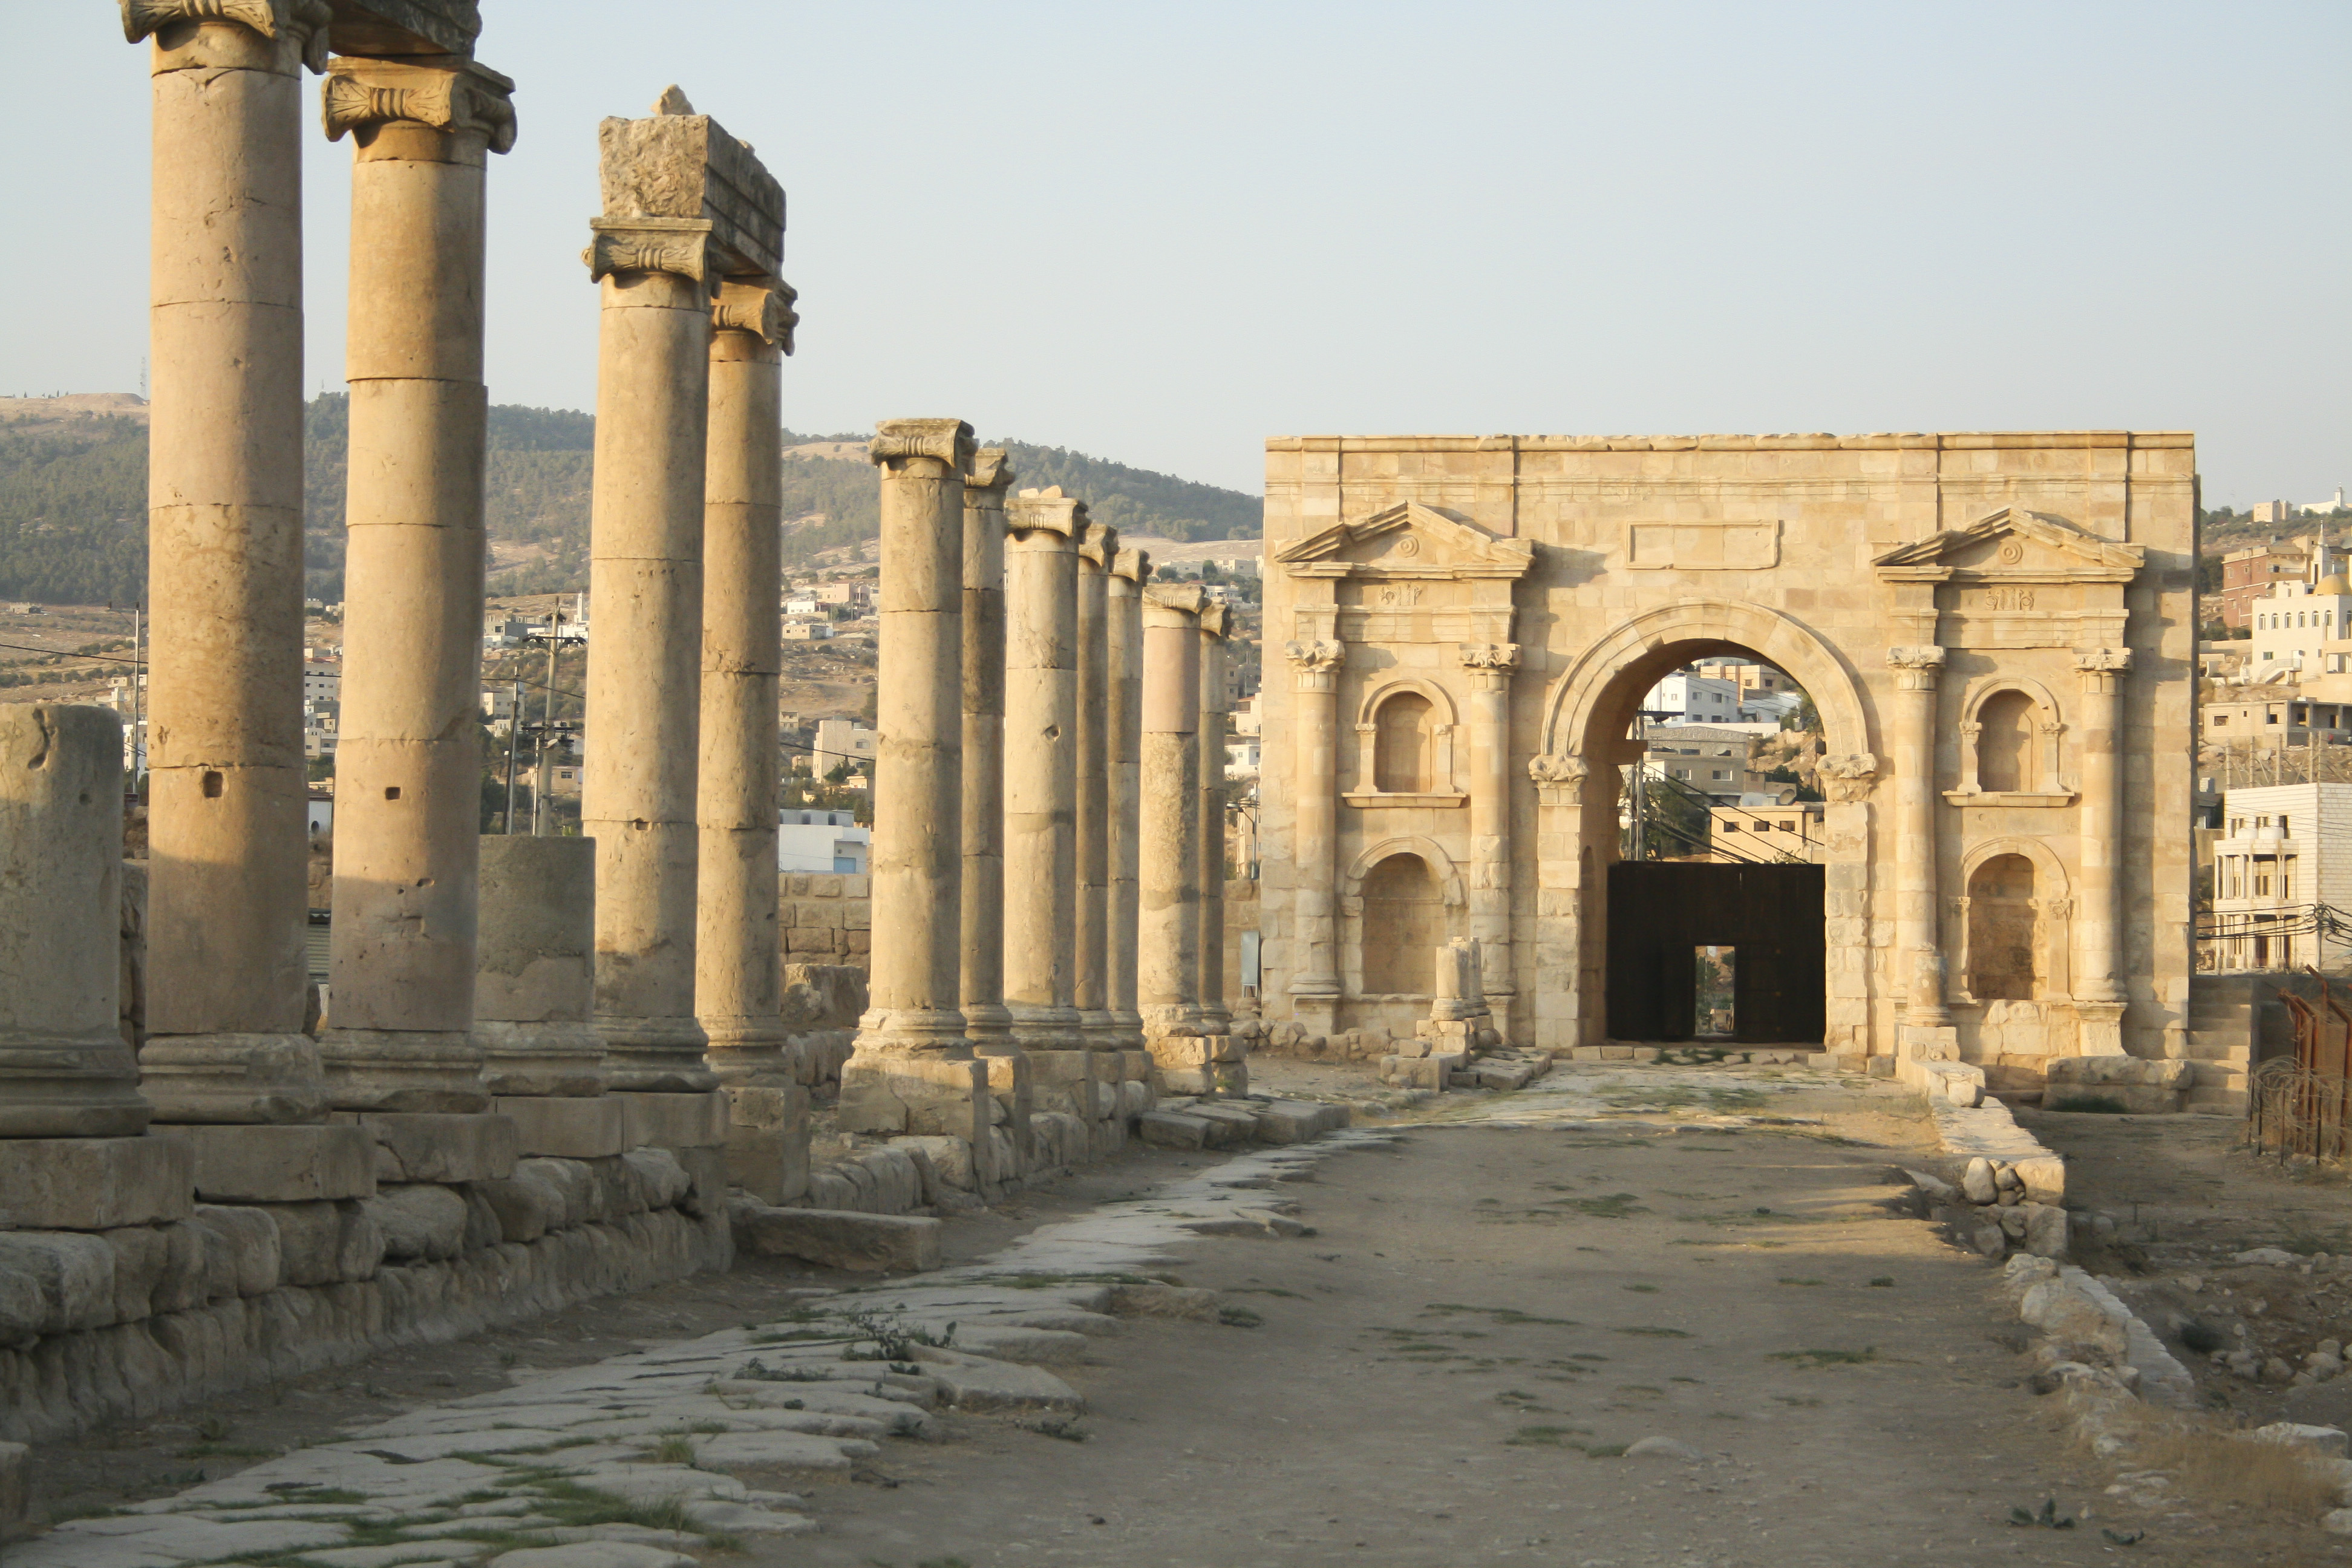 More On Date Gate >> File:North Gate, Jerash, Jordan2.jpg - Wikimedia Commons